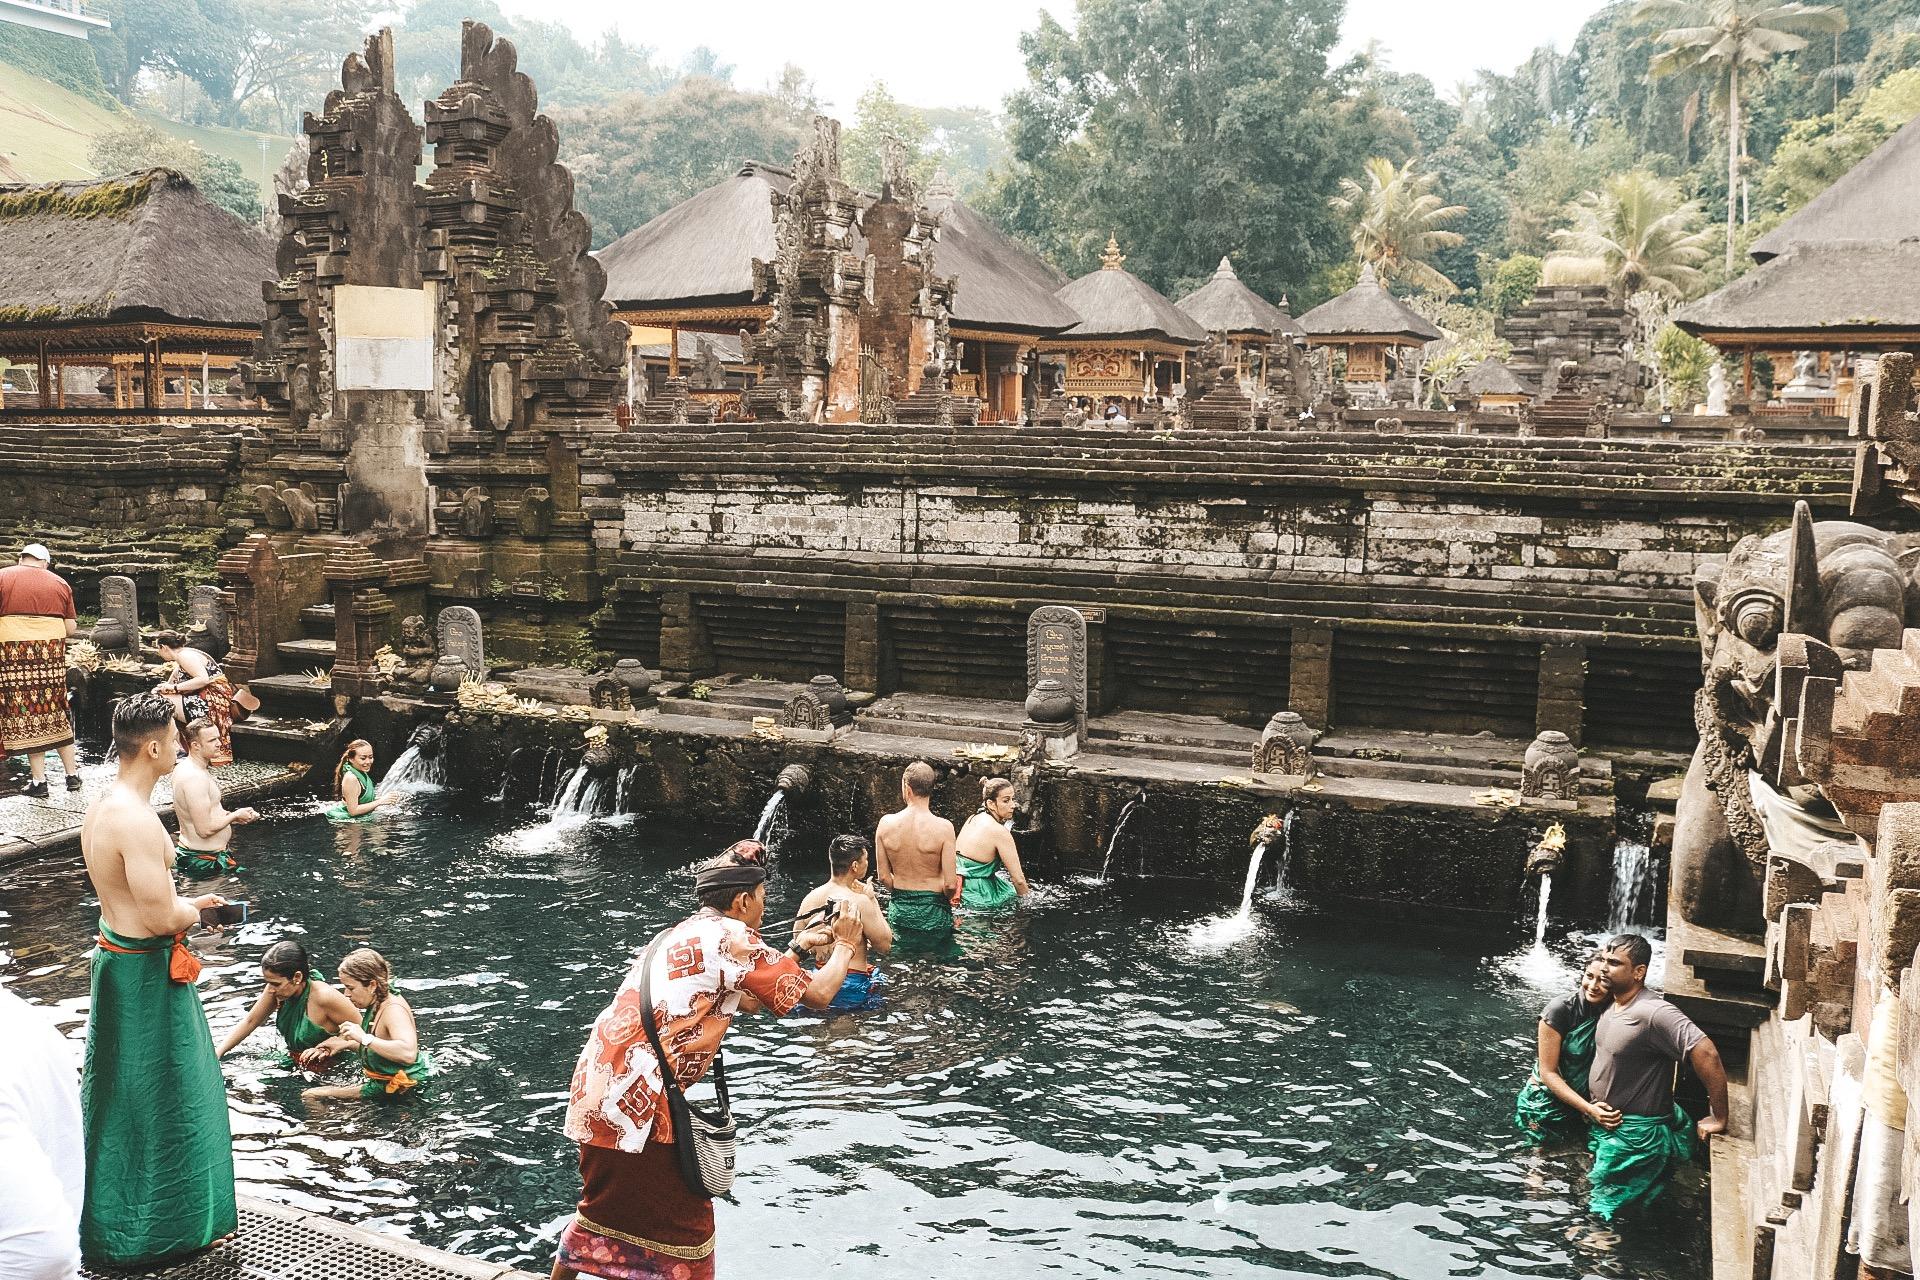 Pura Tirta Empul Holy water temple ubud bali indoensia travel guide